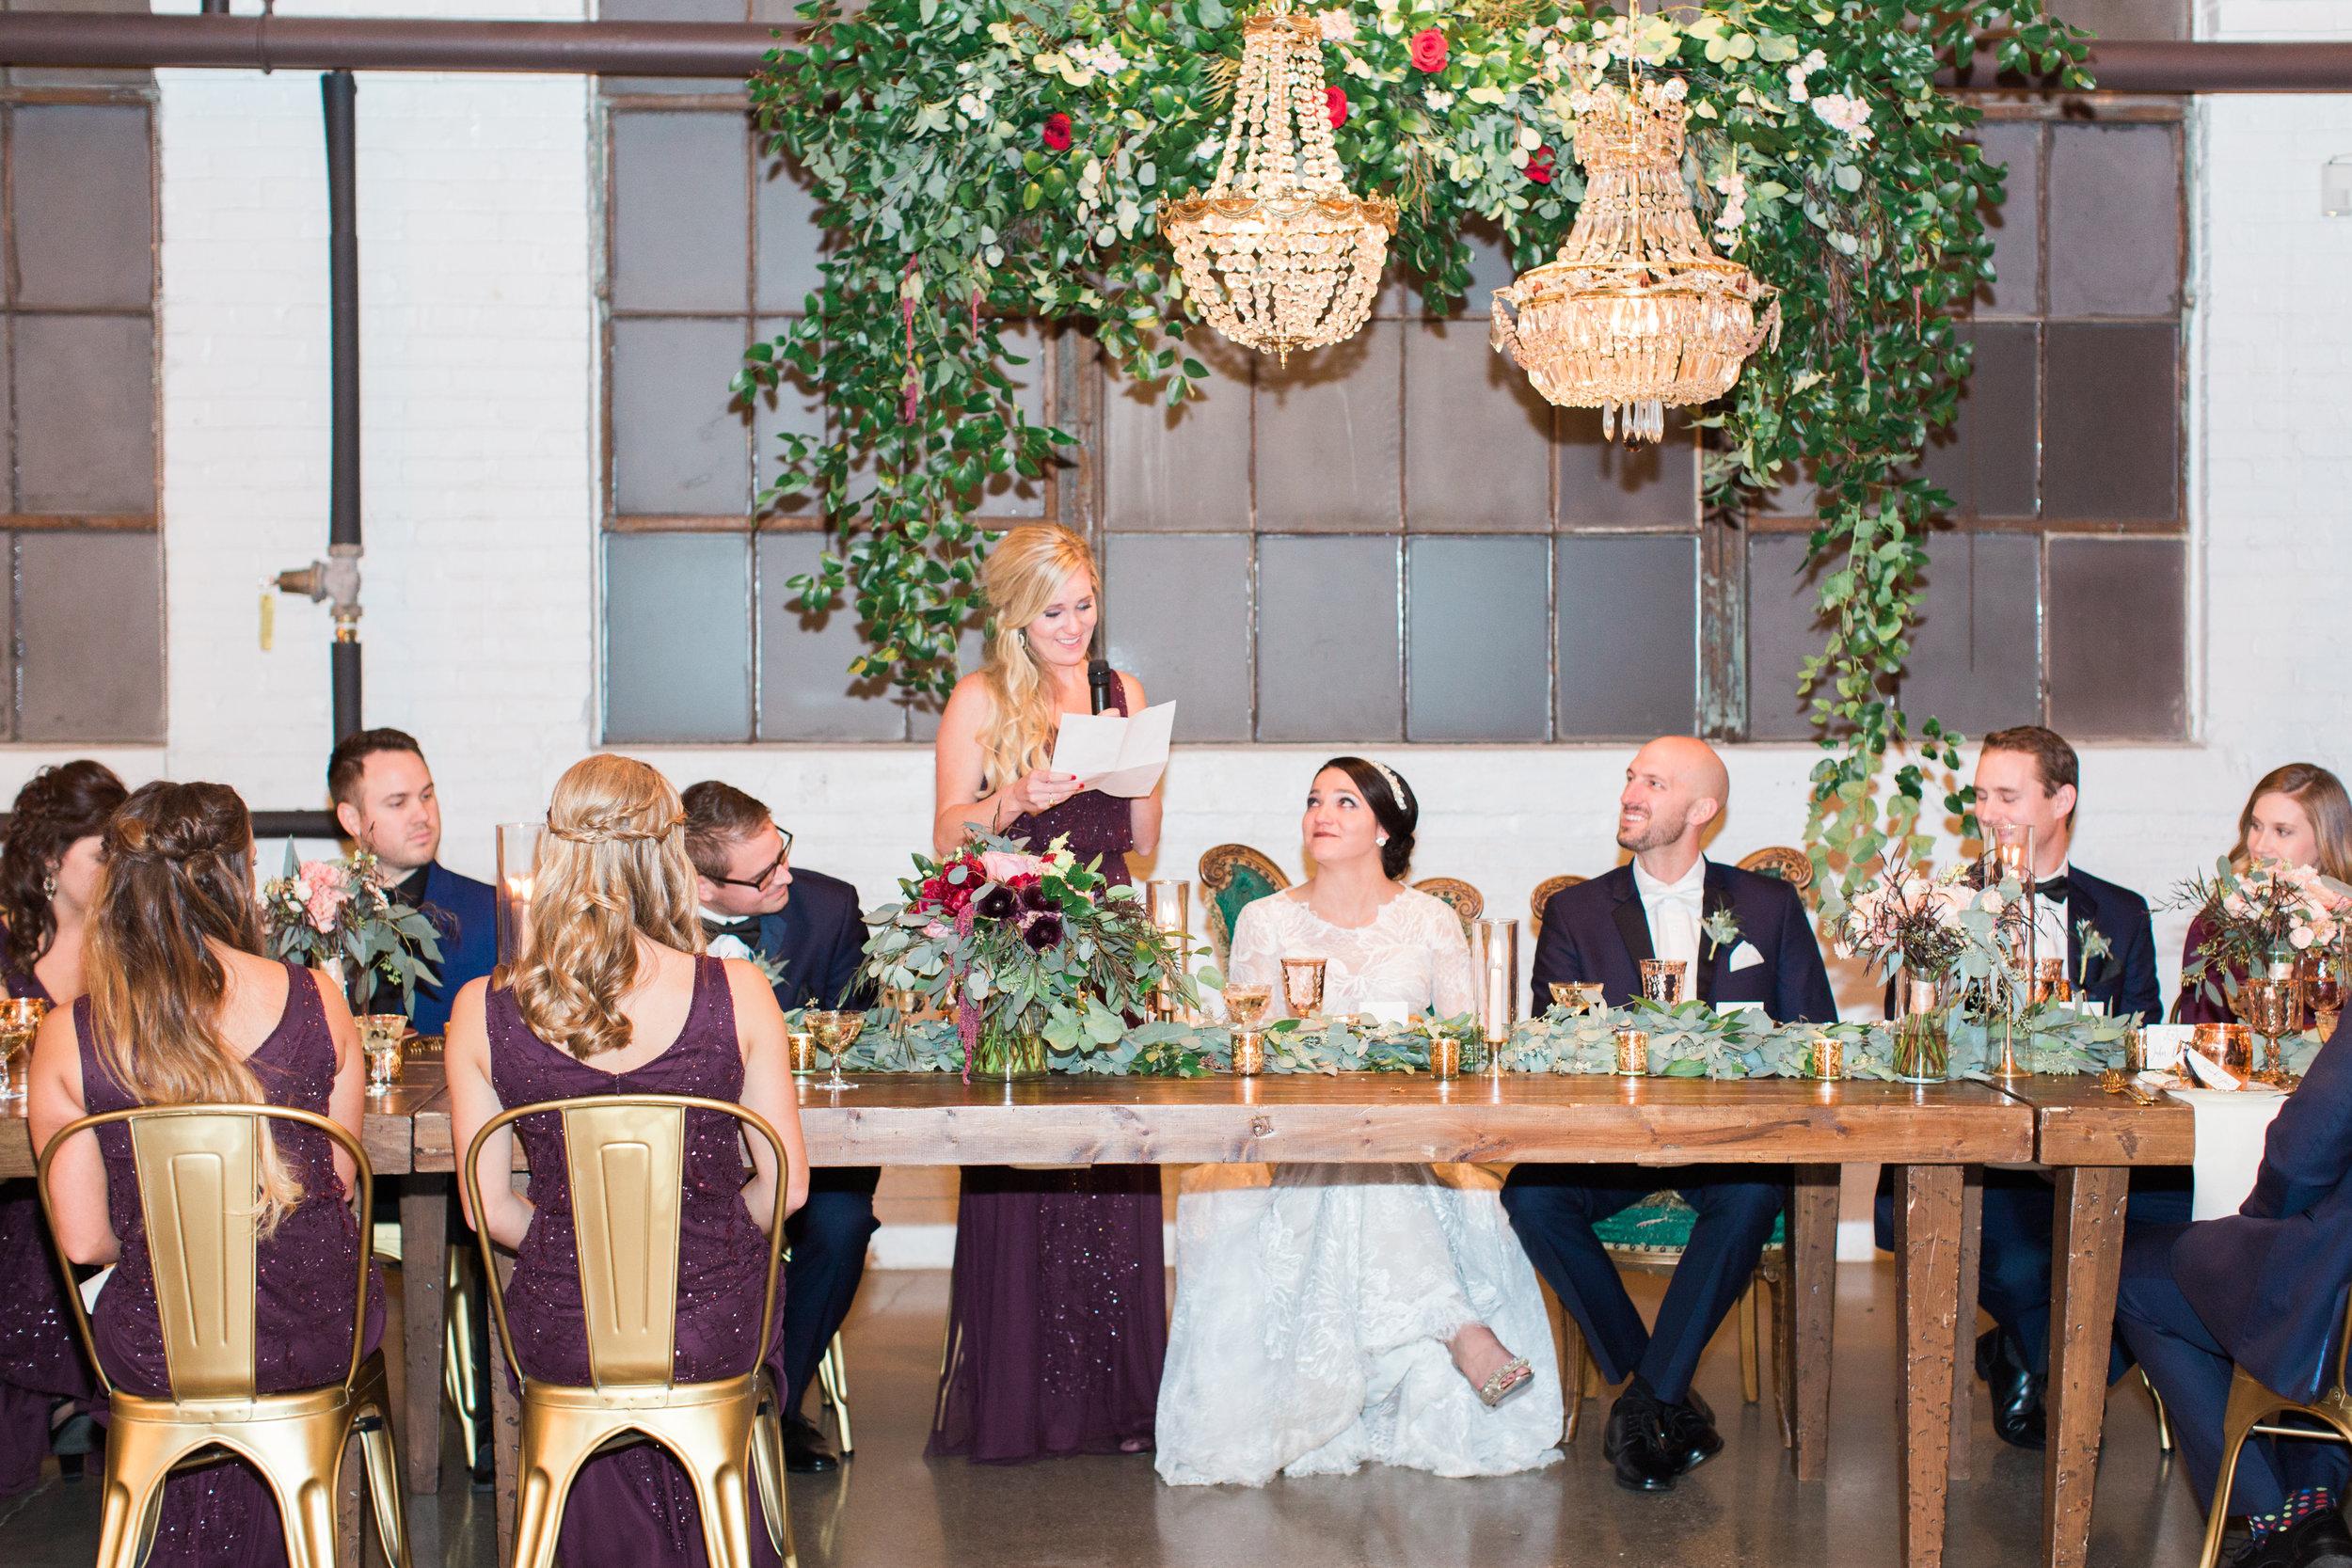 Vogelzang+Wedding+Receptionb-12.jpg